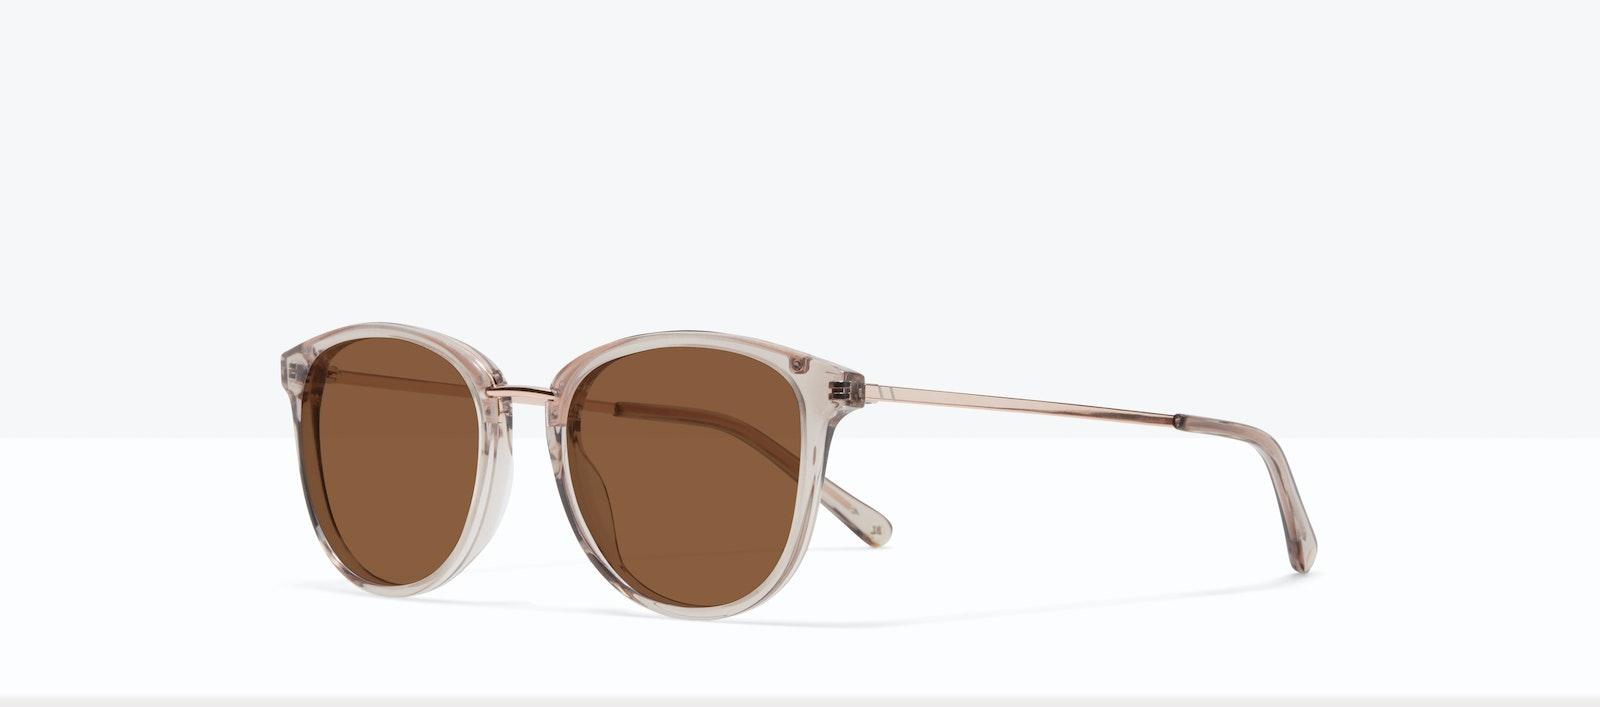 Affordable Fashion Glasses Square Round Sunglasses Women Bella XS Sand Tilt